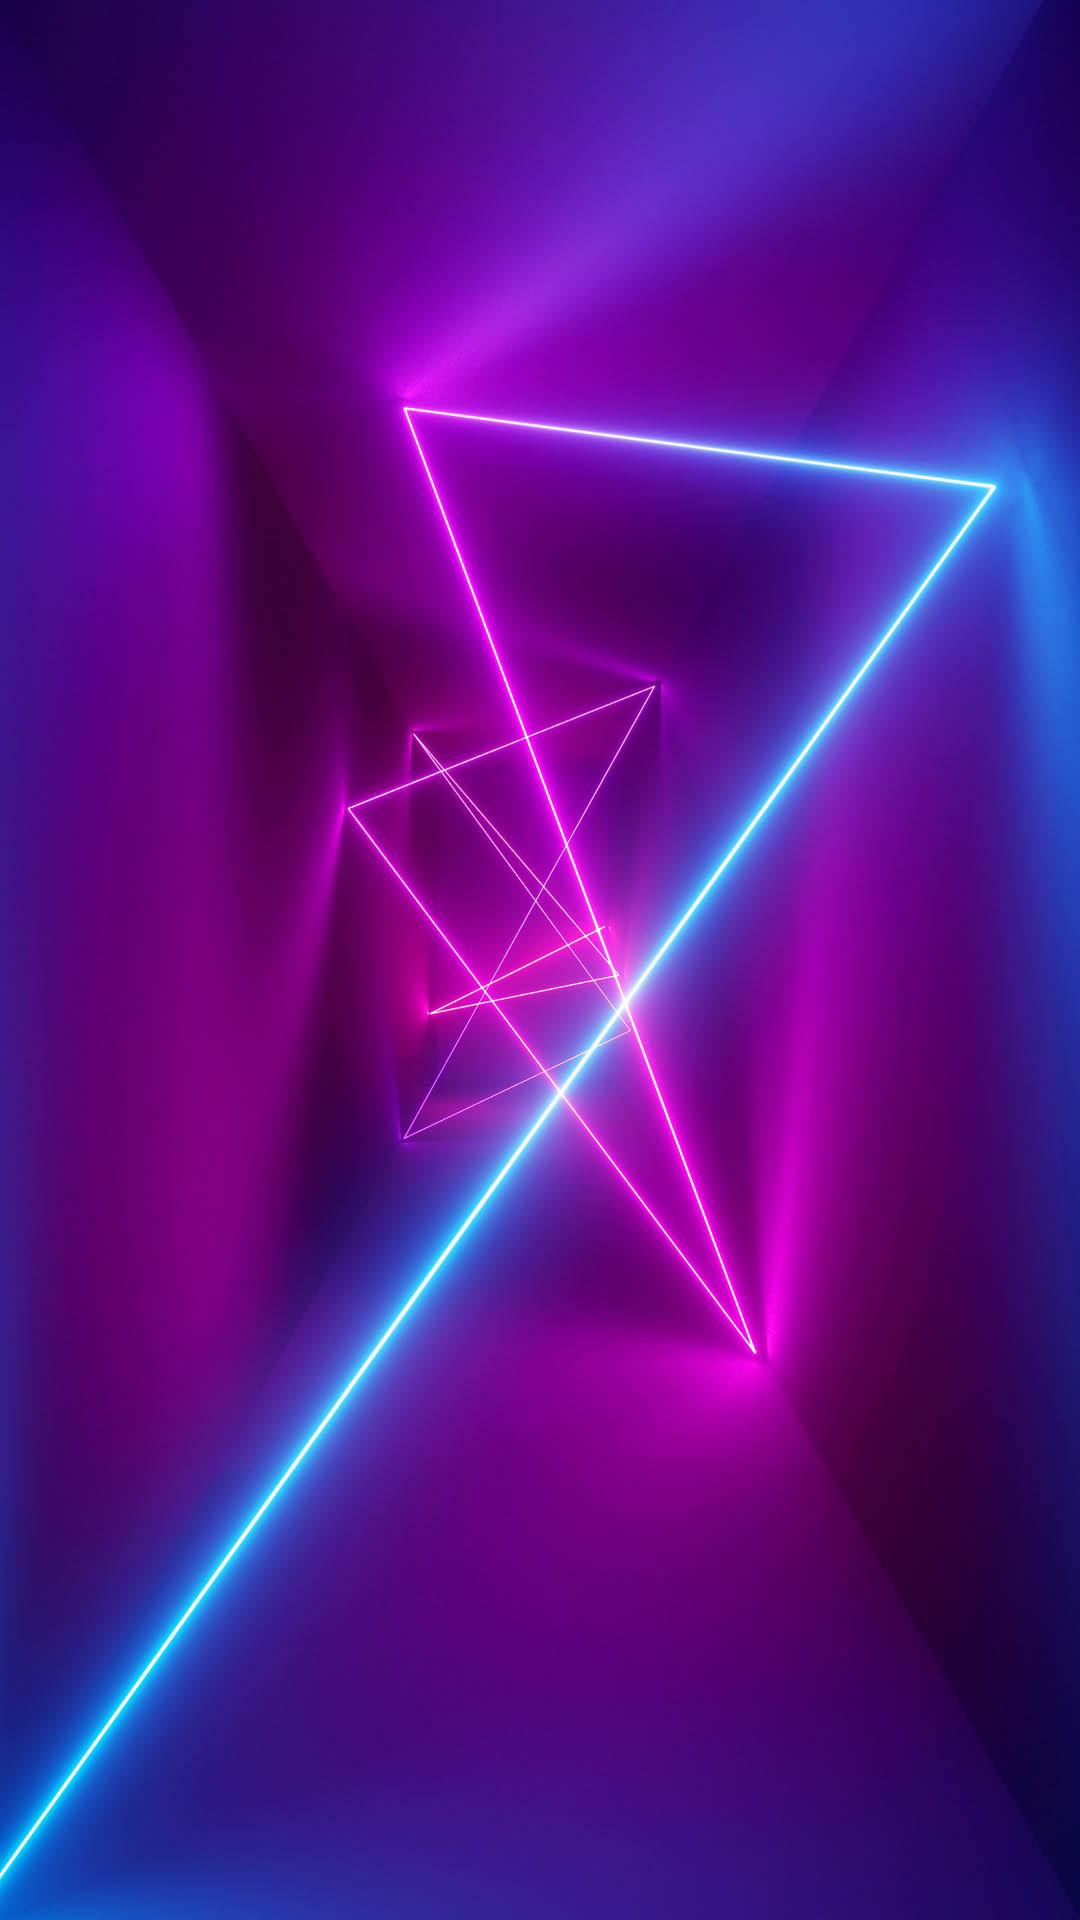 Neon Rays iPhone Wallpaper